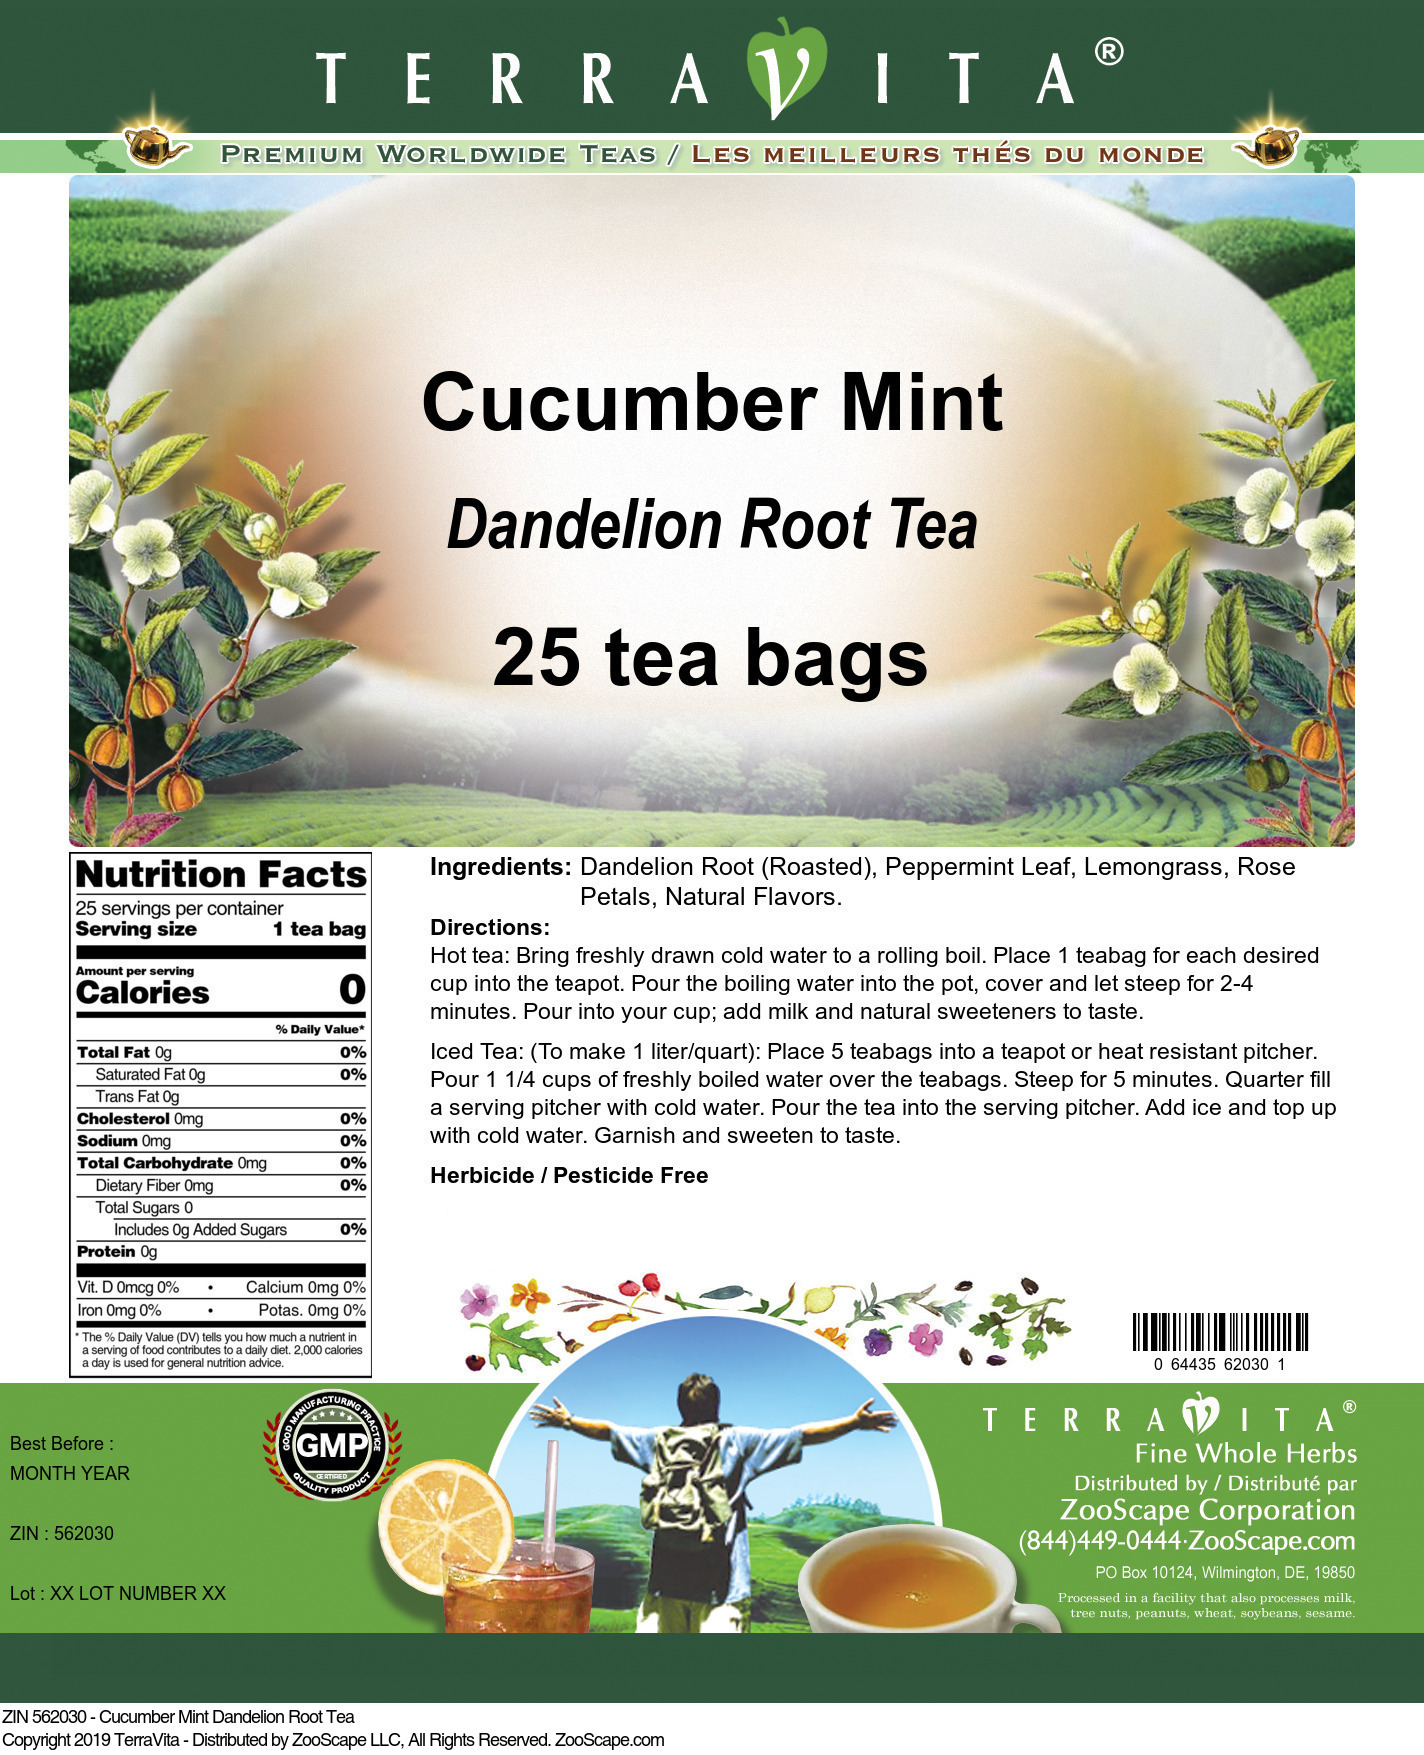 Cucumber Mint Dandelion Root Tea